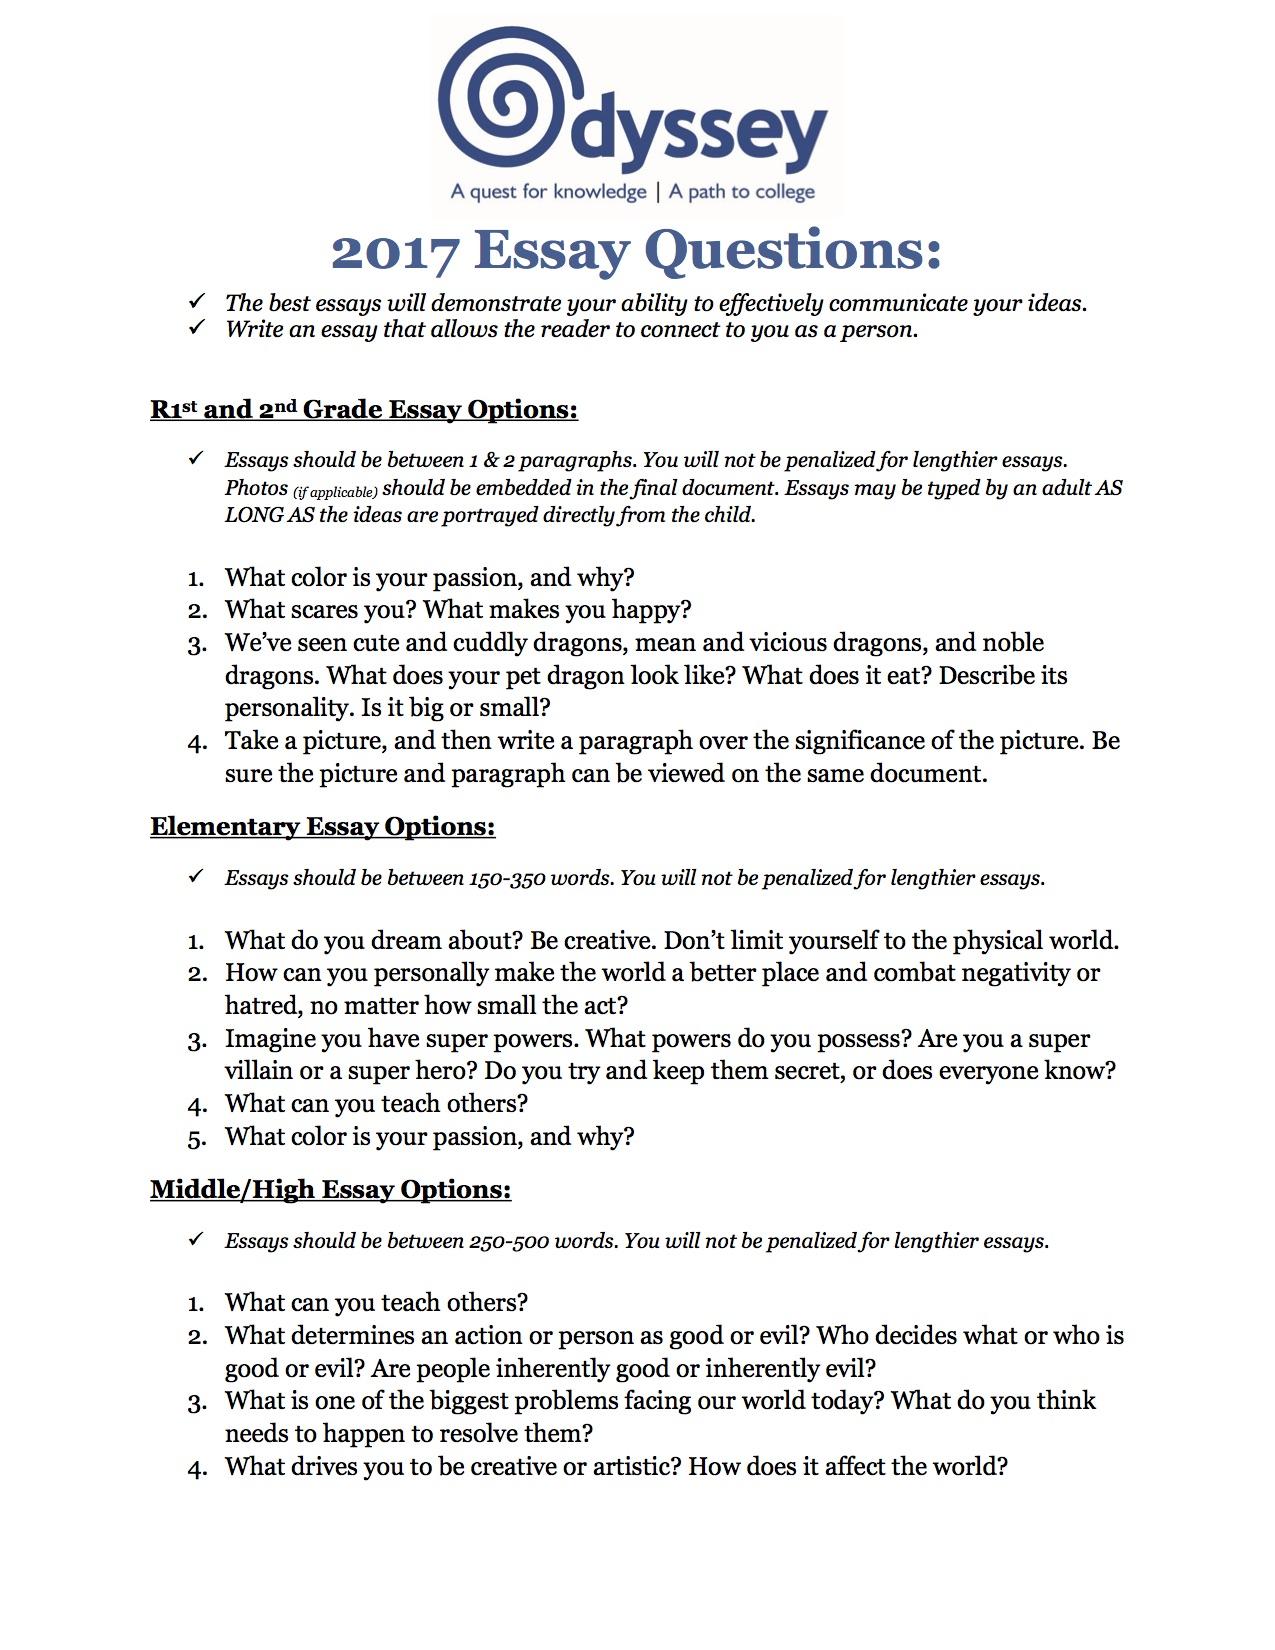 015 Best Essay Topics Example 5829f1d2c75f9a7c5588b1c6 Proposed20essay20topics202017 Surprising Research Paper For College Student High School Argumentative Full